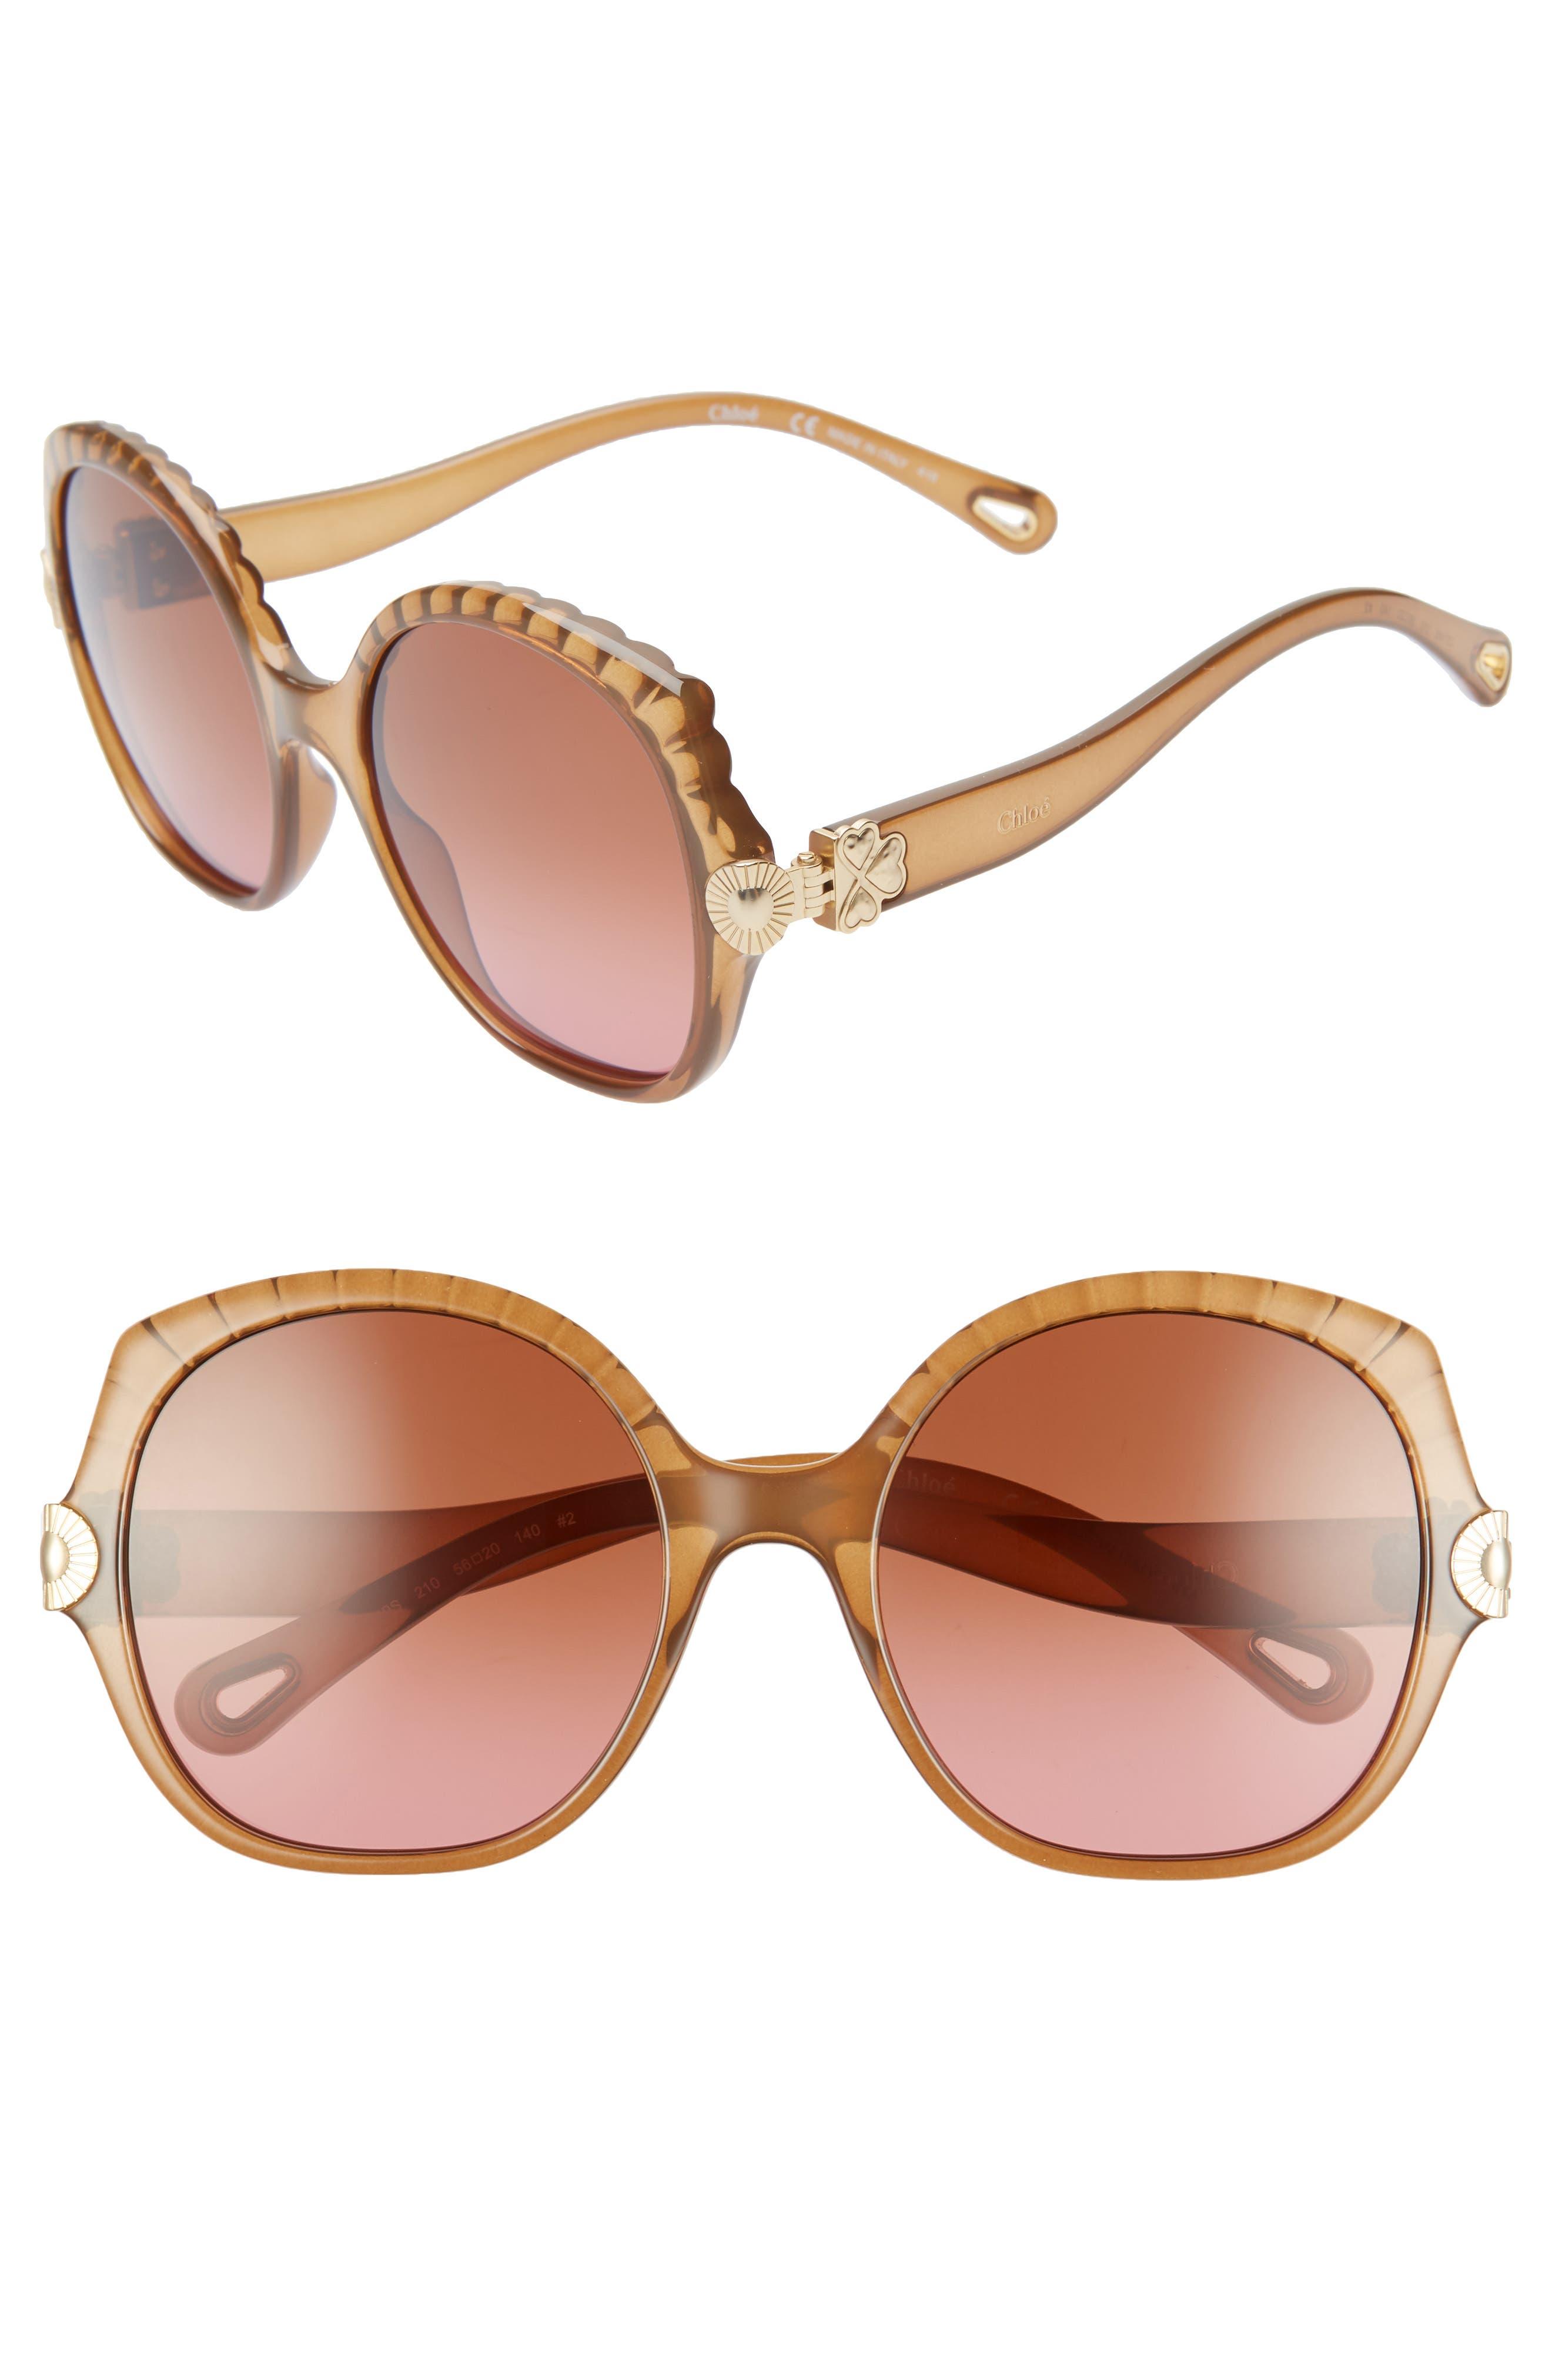 Image of Chloe 56mm Round Sunglasses